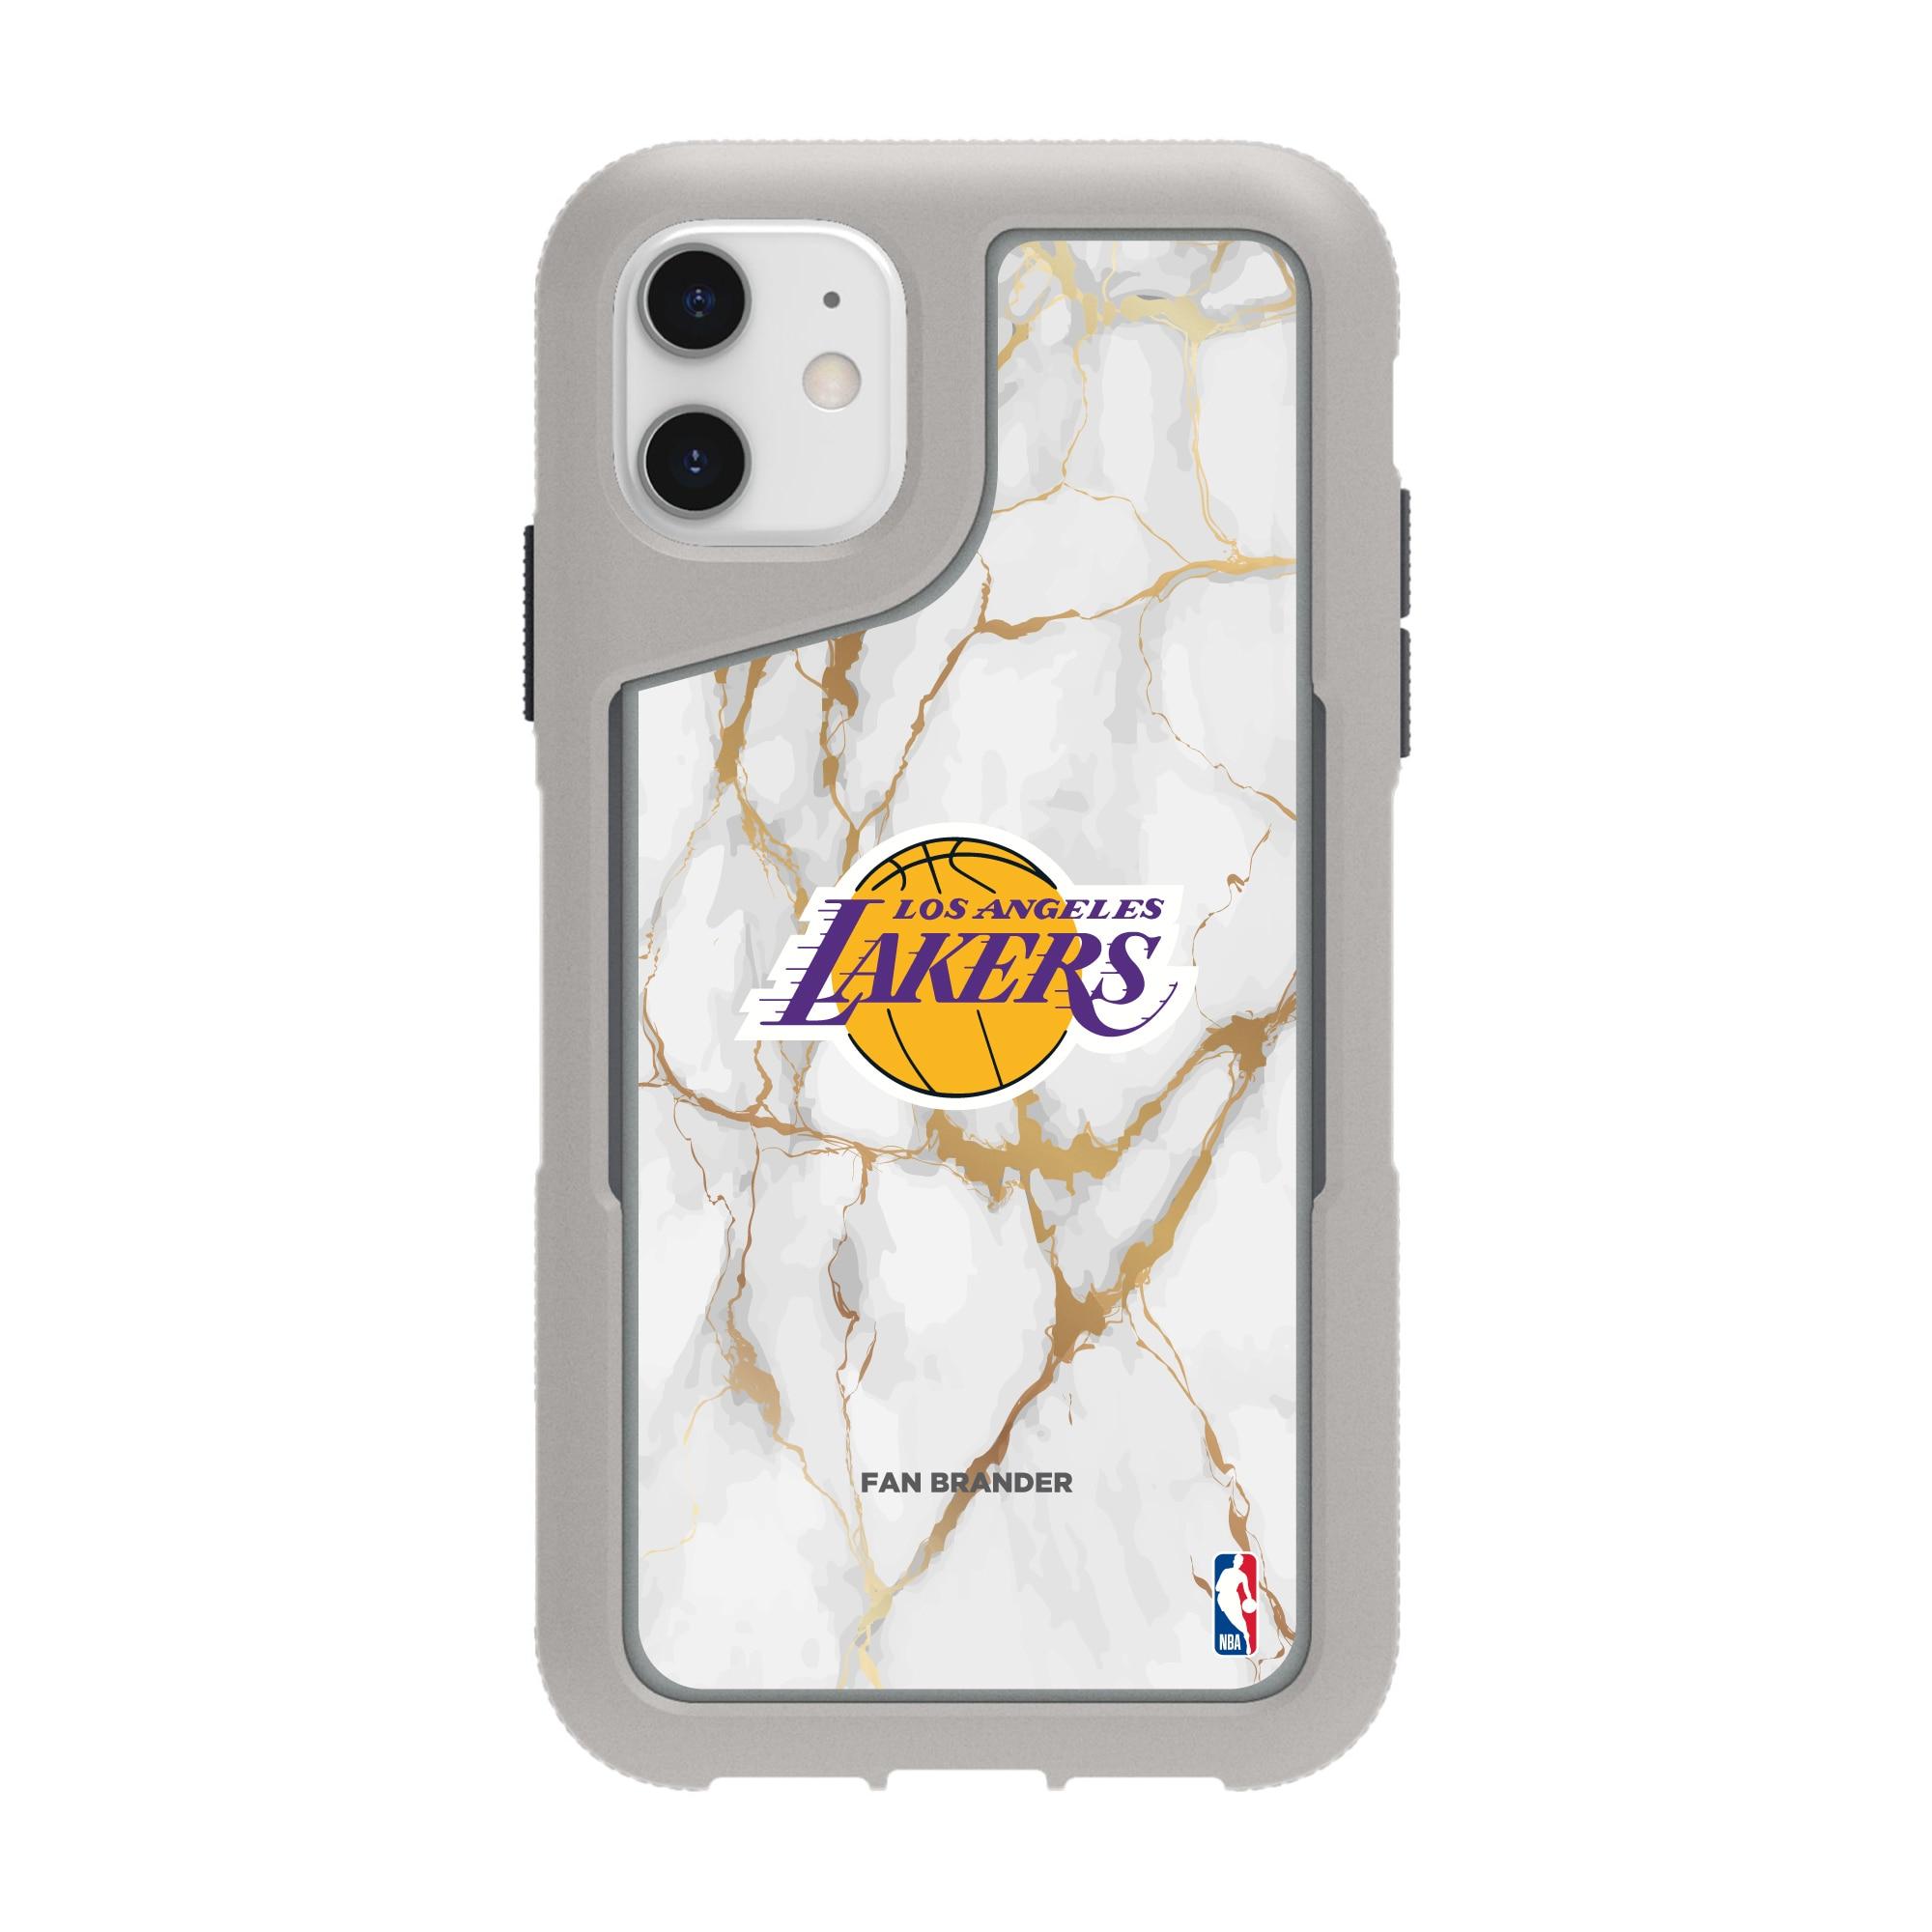 Los Angeles Lakers Griffin Survivor Endurance Marble iPhone Case - Gray